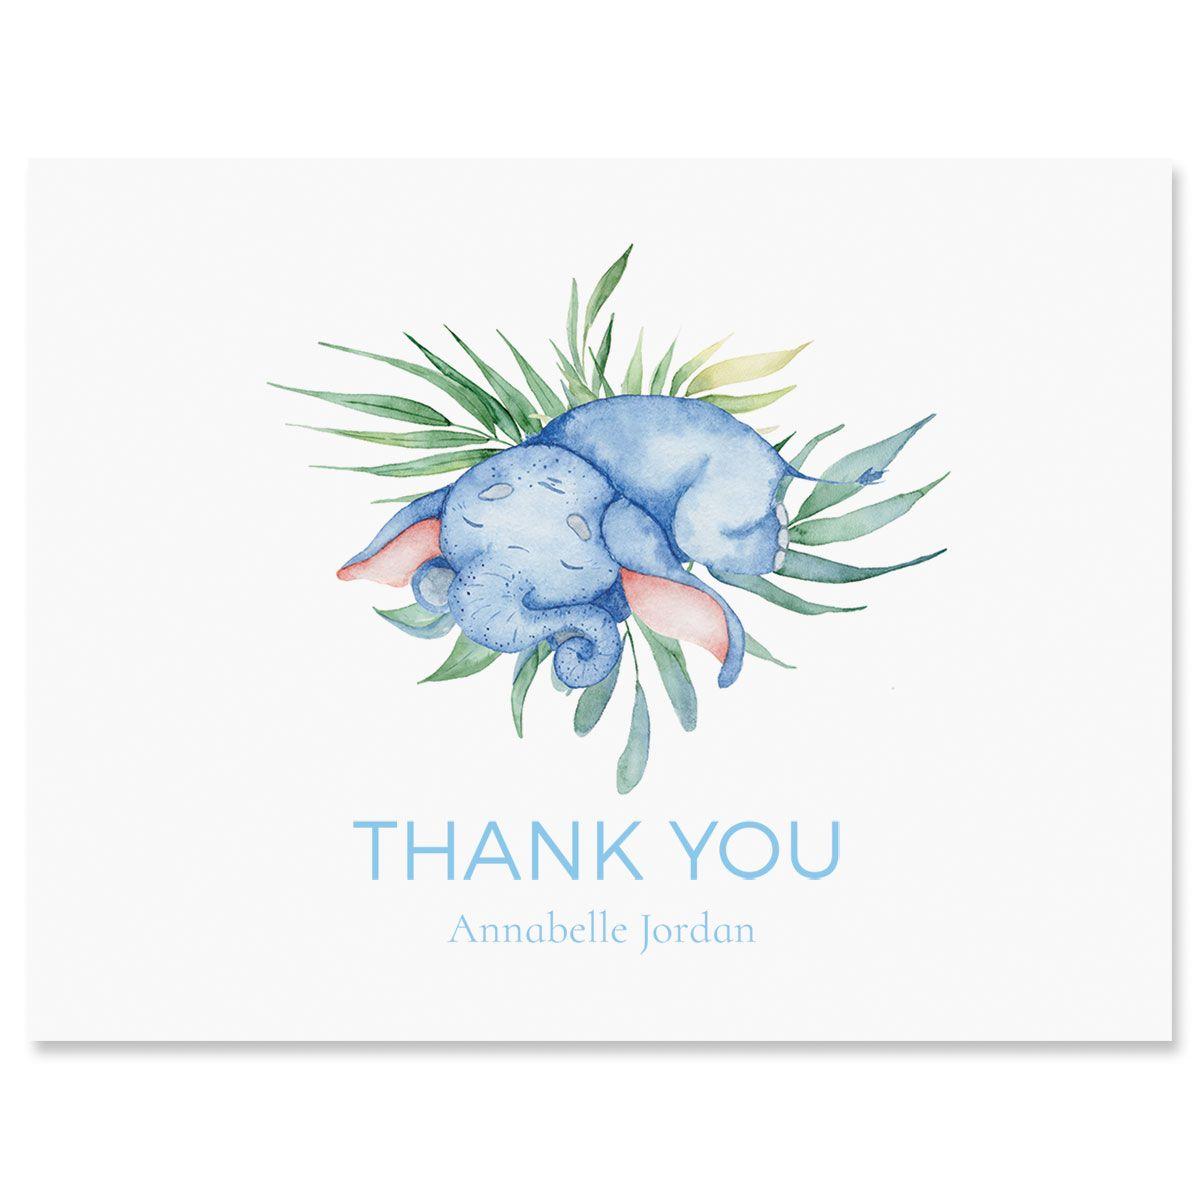 Personalized Sleeping Elephant Thank You Cards